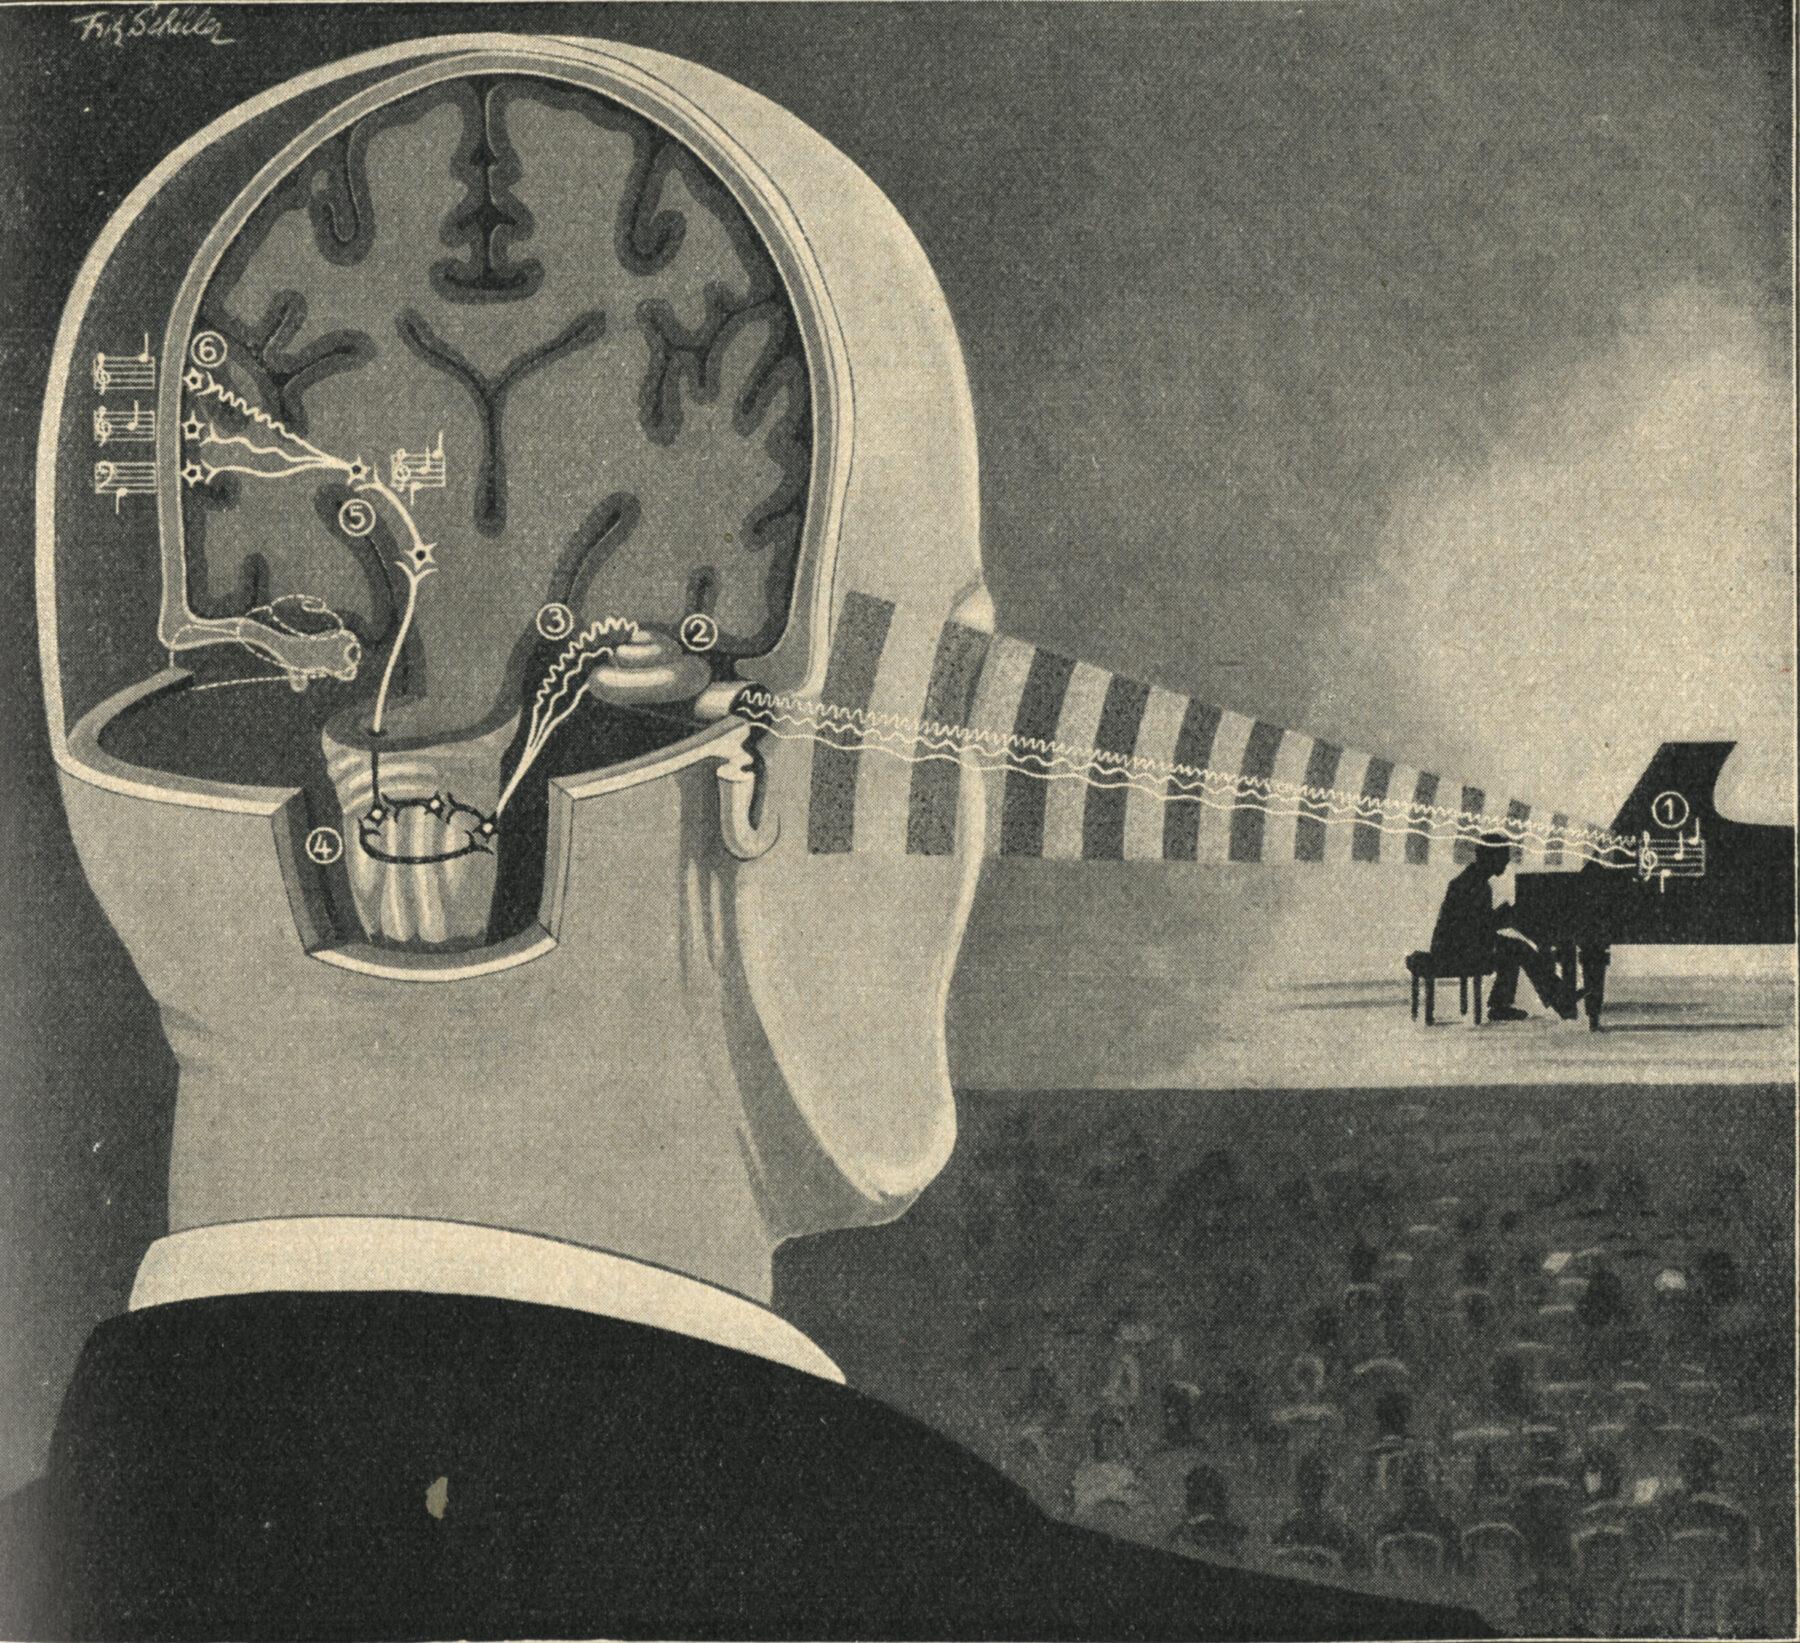 Sound perception, Kahn, Das Leben des Menschen 4 (1929), 197. Art: Fritz Schüler. National Library of Medicine.